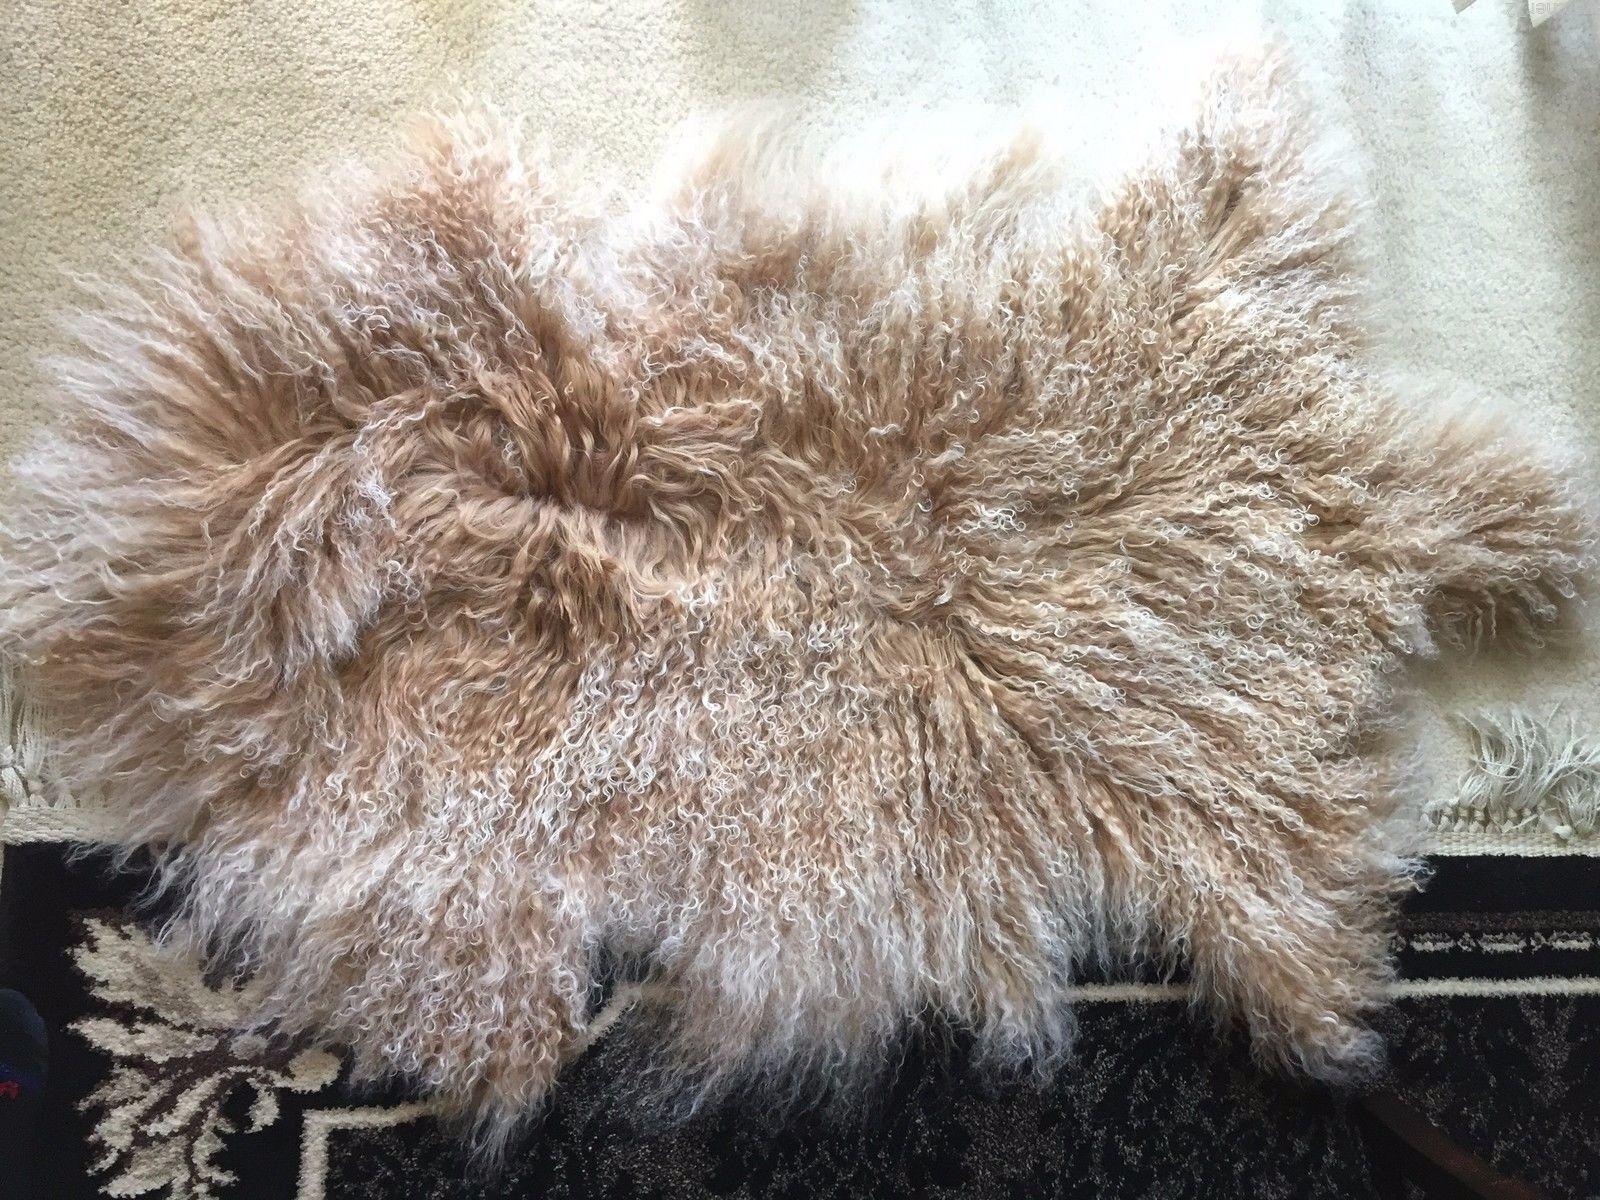 Genuine Mongolian Tibetan  sheepskin sheepskin sheepskin Fur wool pelt Rug Beige with snow top 35bce9